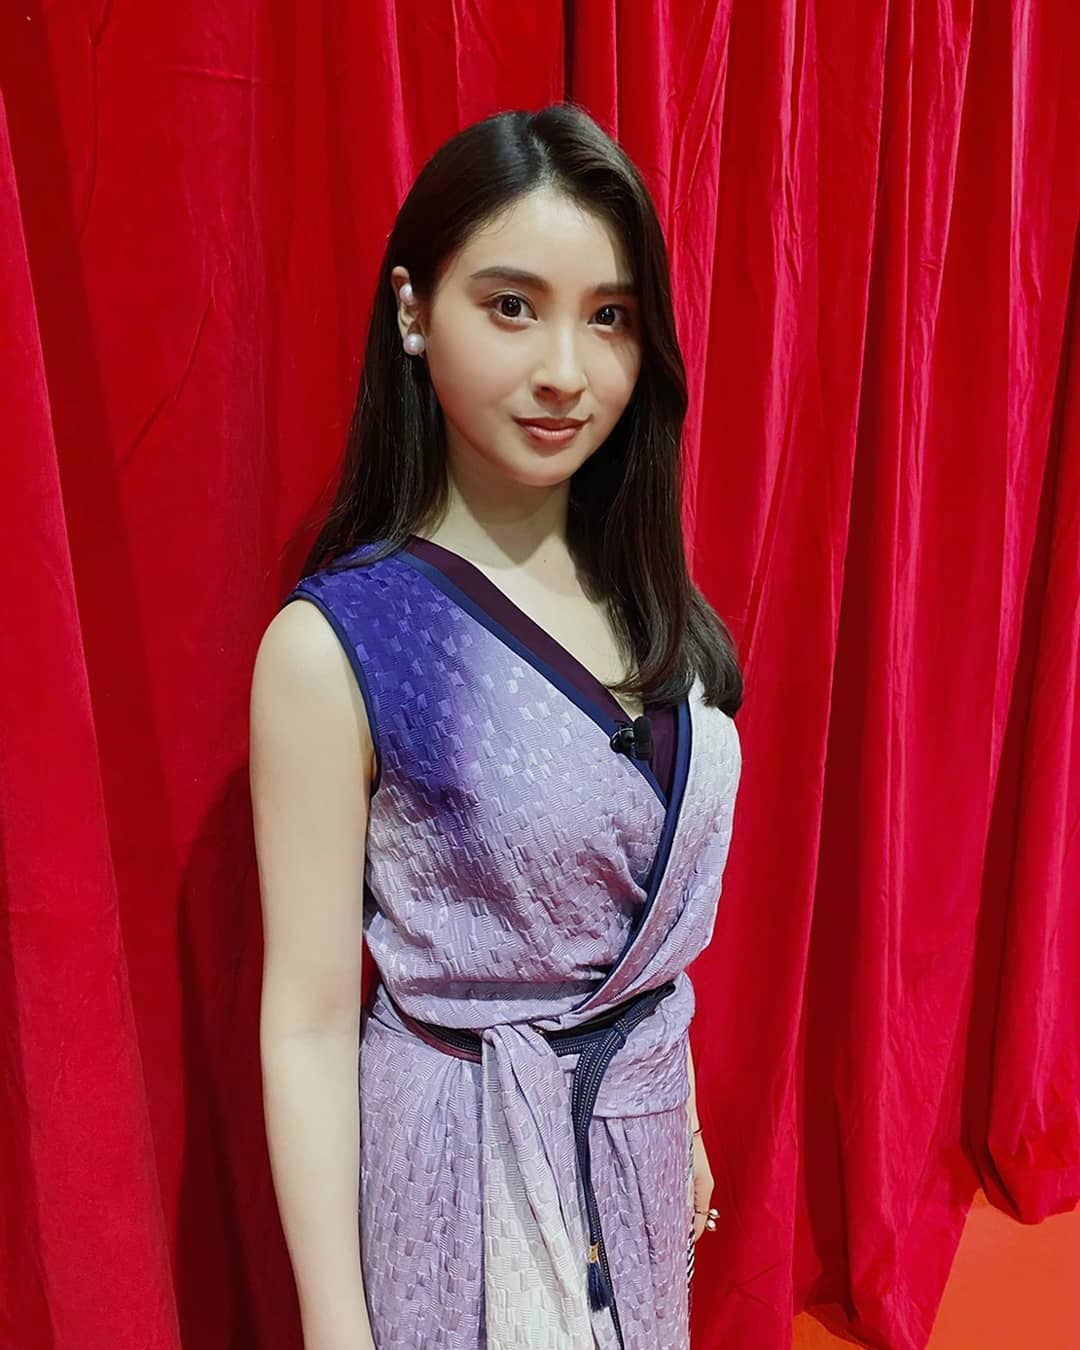 Tao Tsuchiya hot photo